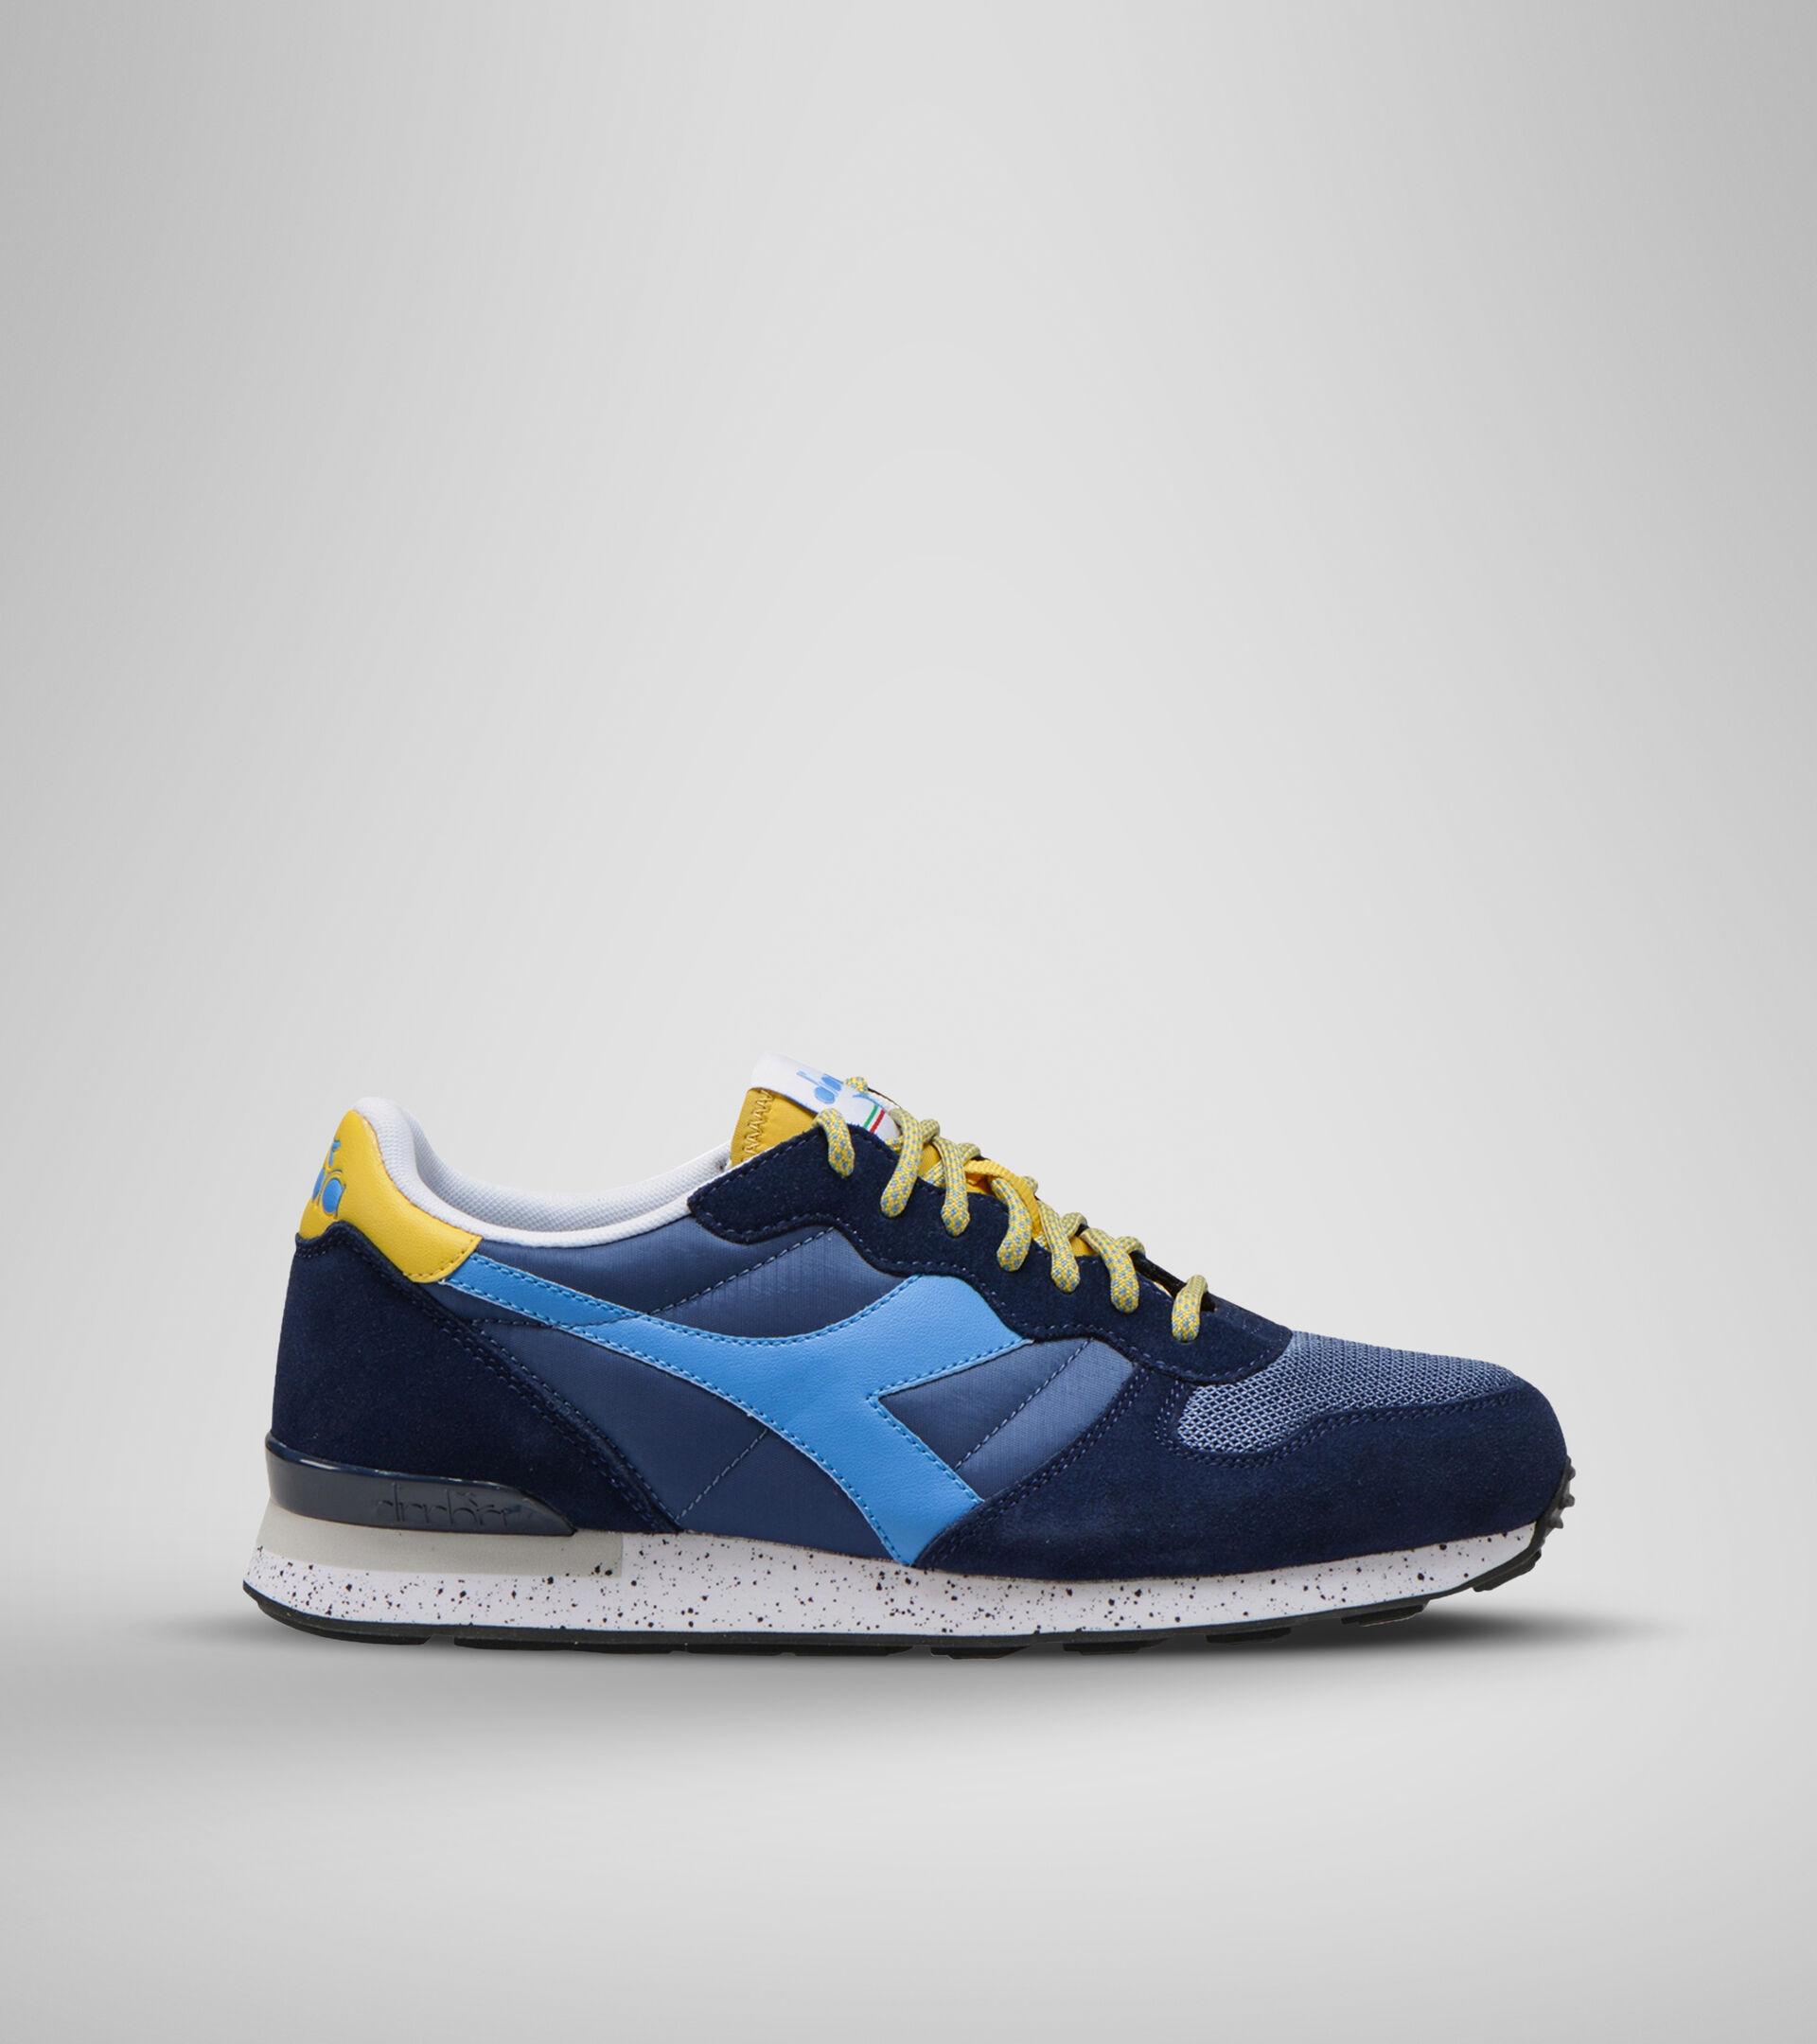 Footwear Sportswear UNISEX CAMARO OUTDOOR ENSIGN BL/AZURE BL/MISTED YLLW Diadora